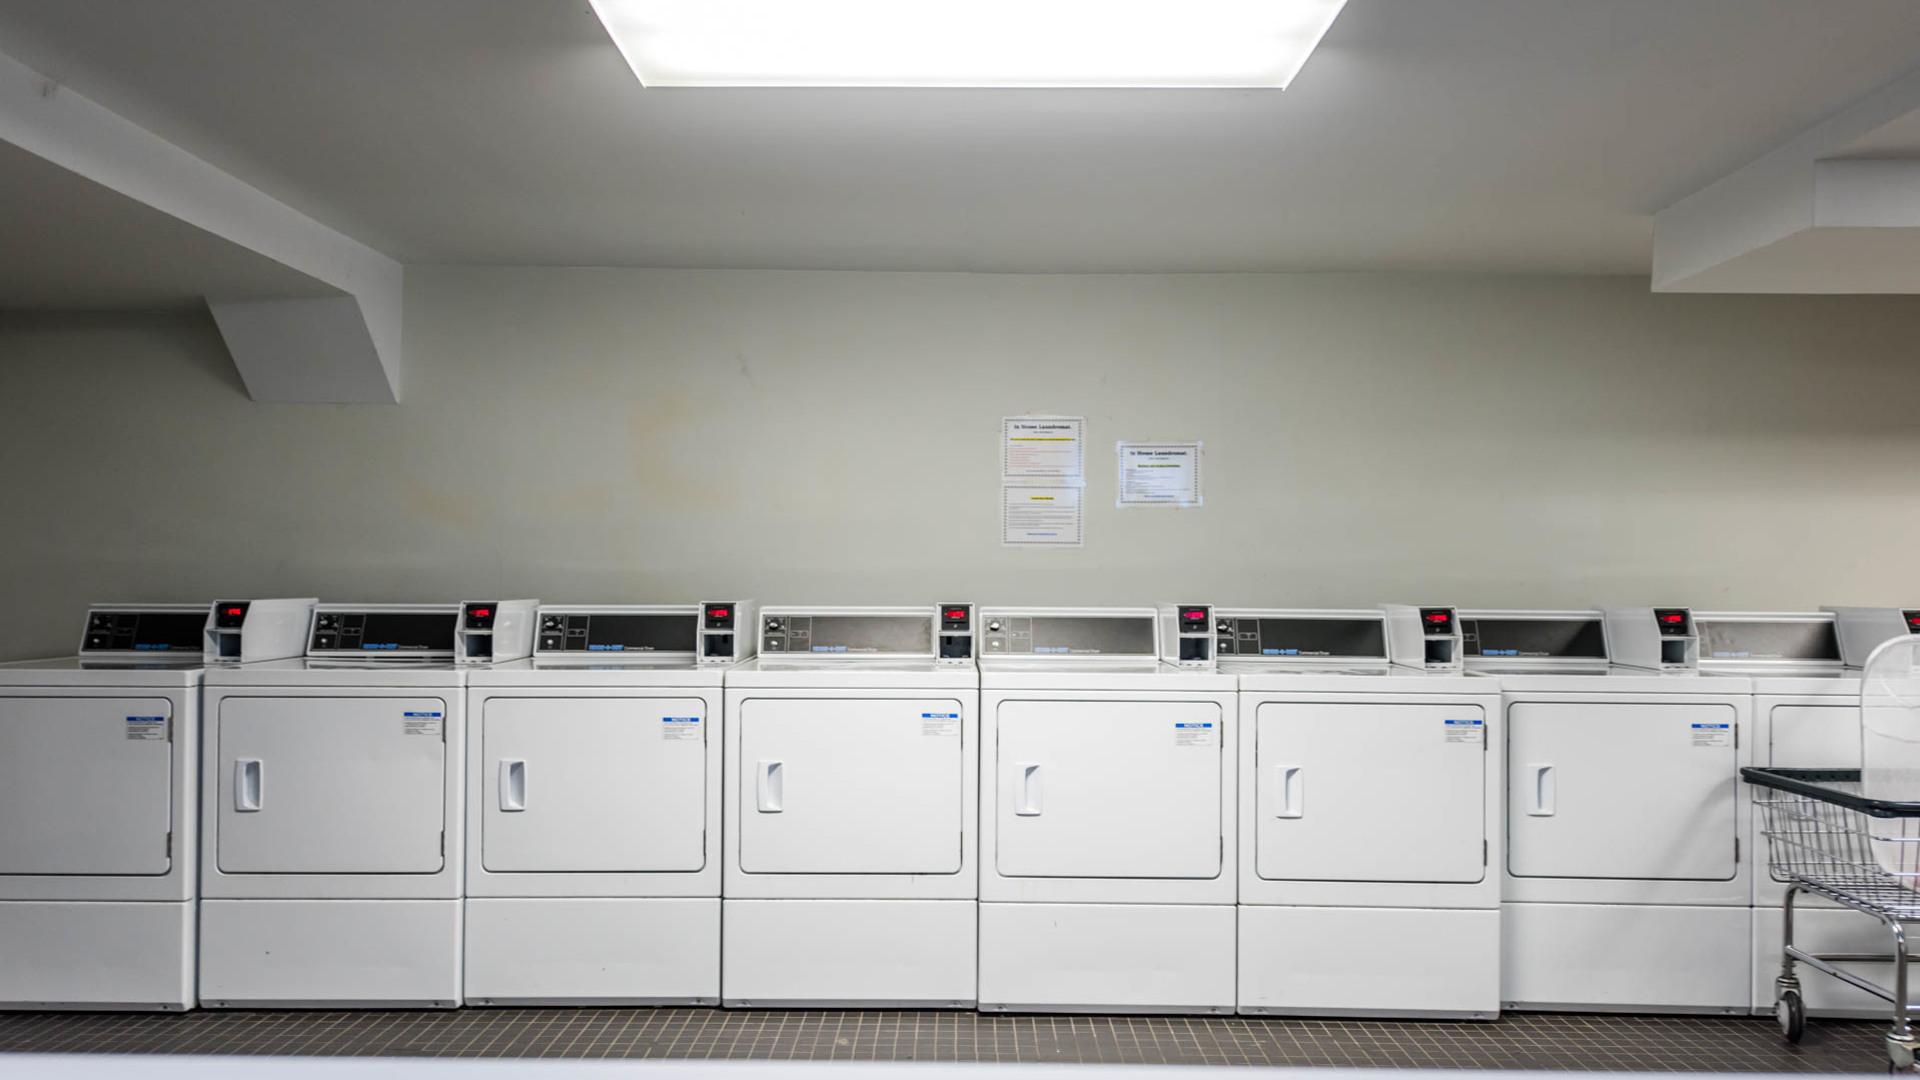 020 1635 putnam avenue bike laundry 5